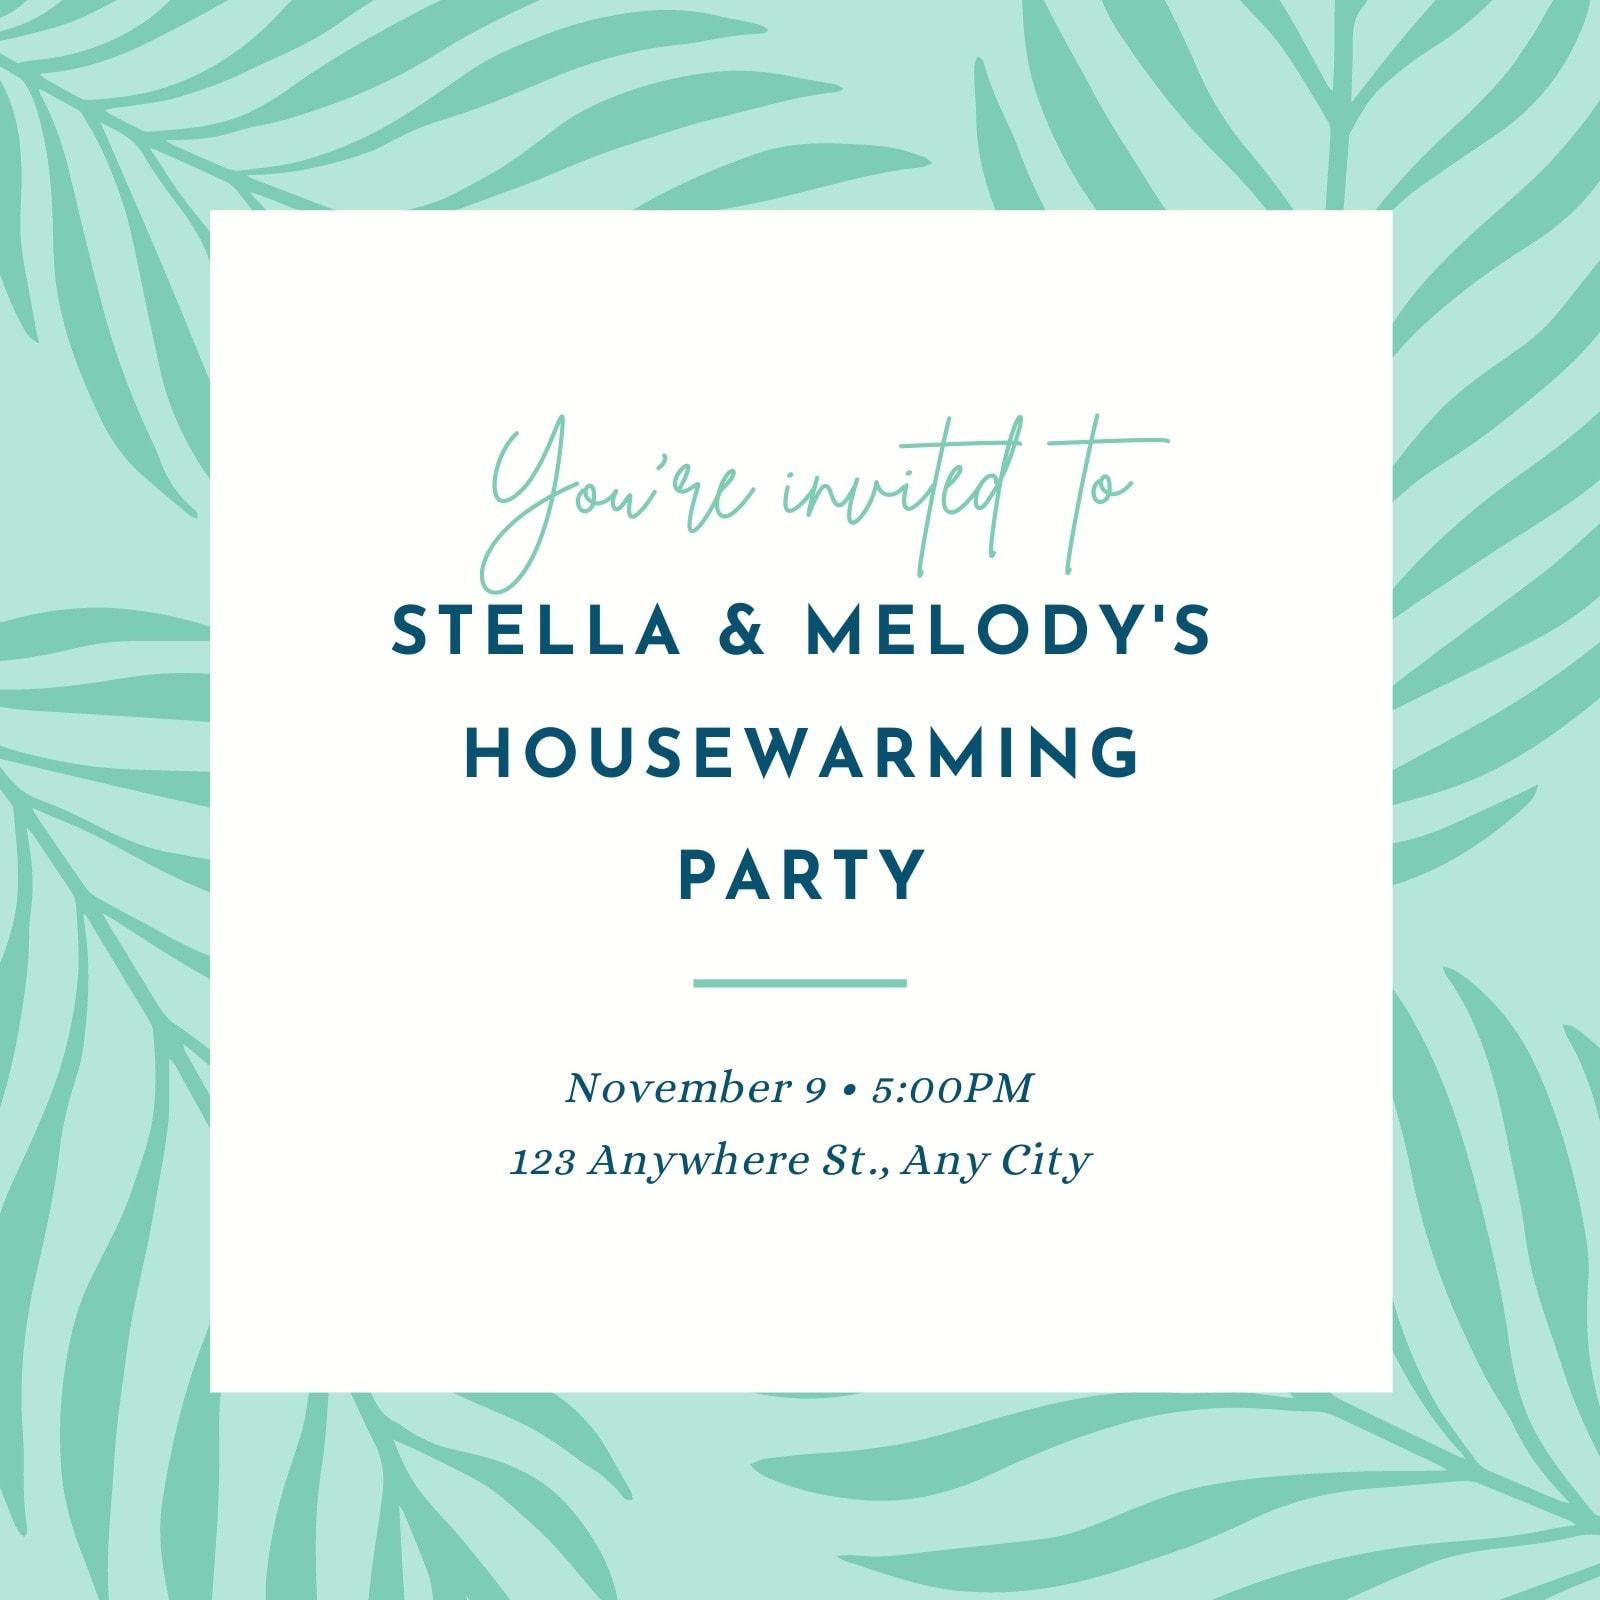 Green Leaves Illustration Housewarming Party Invitation